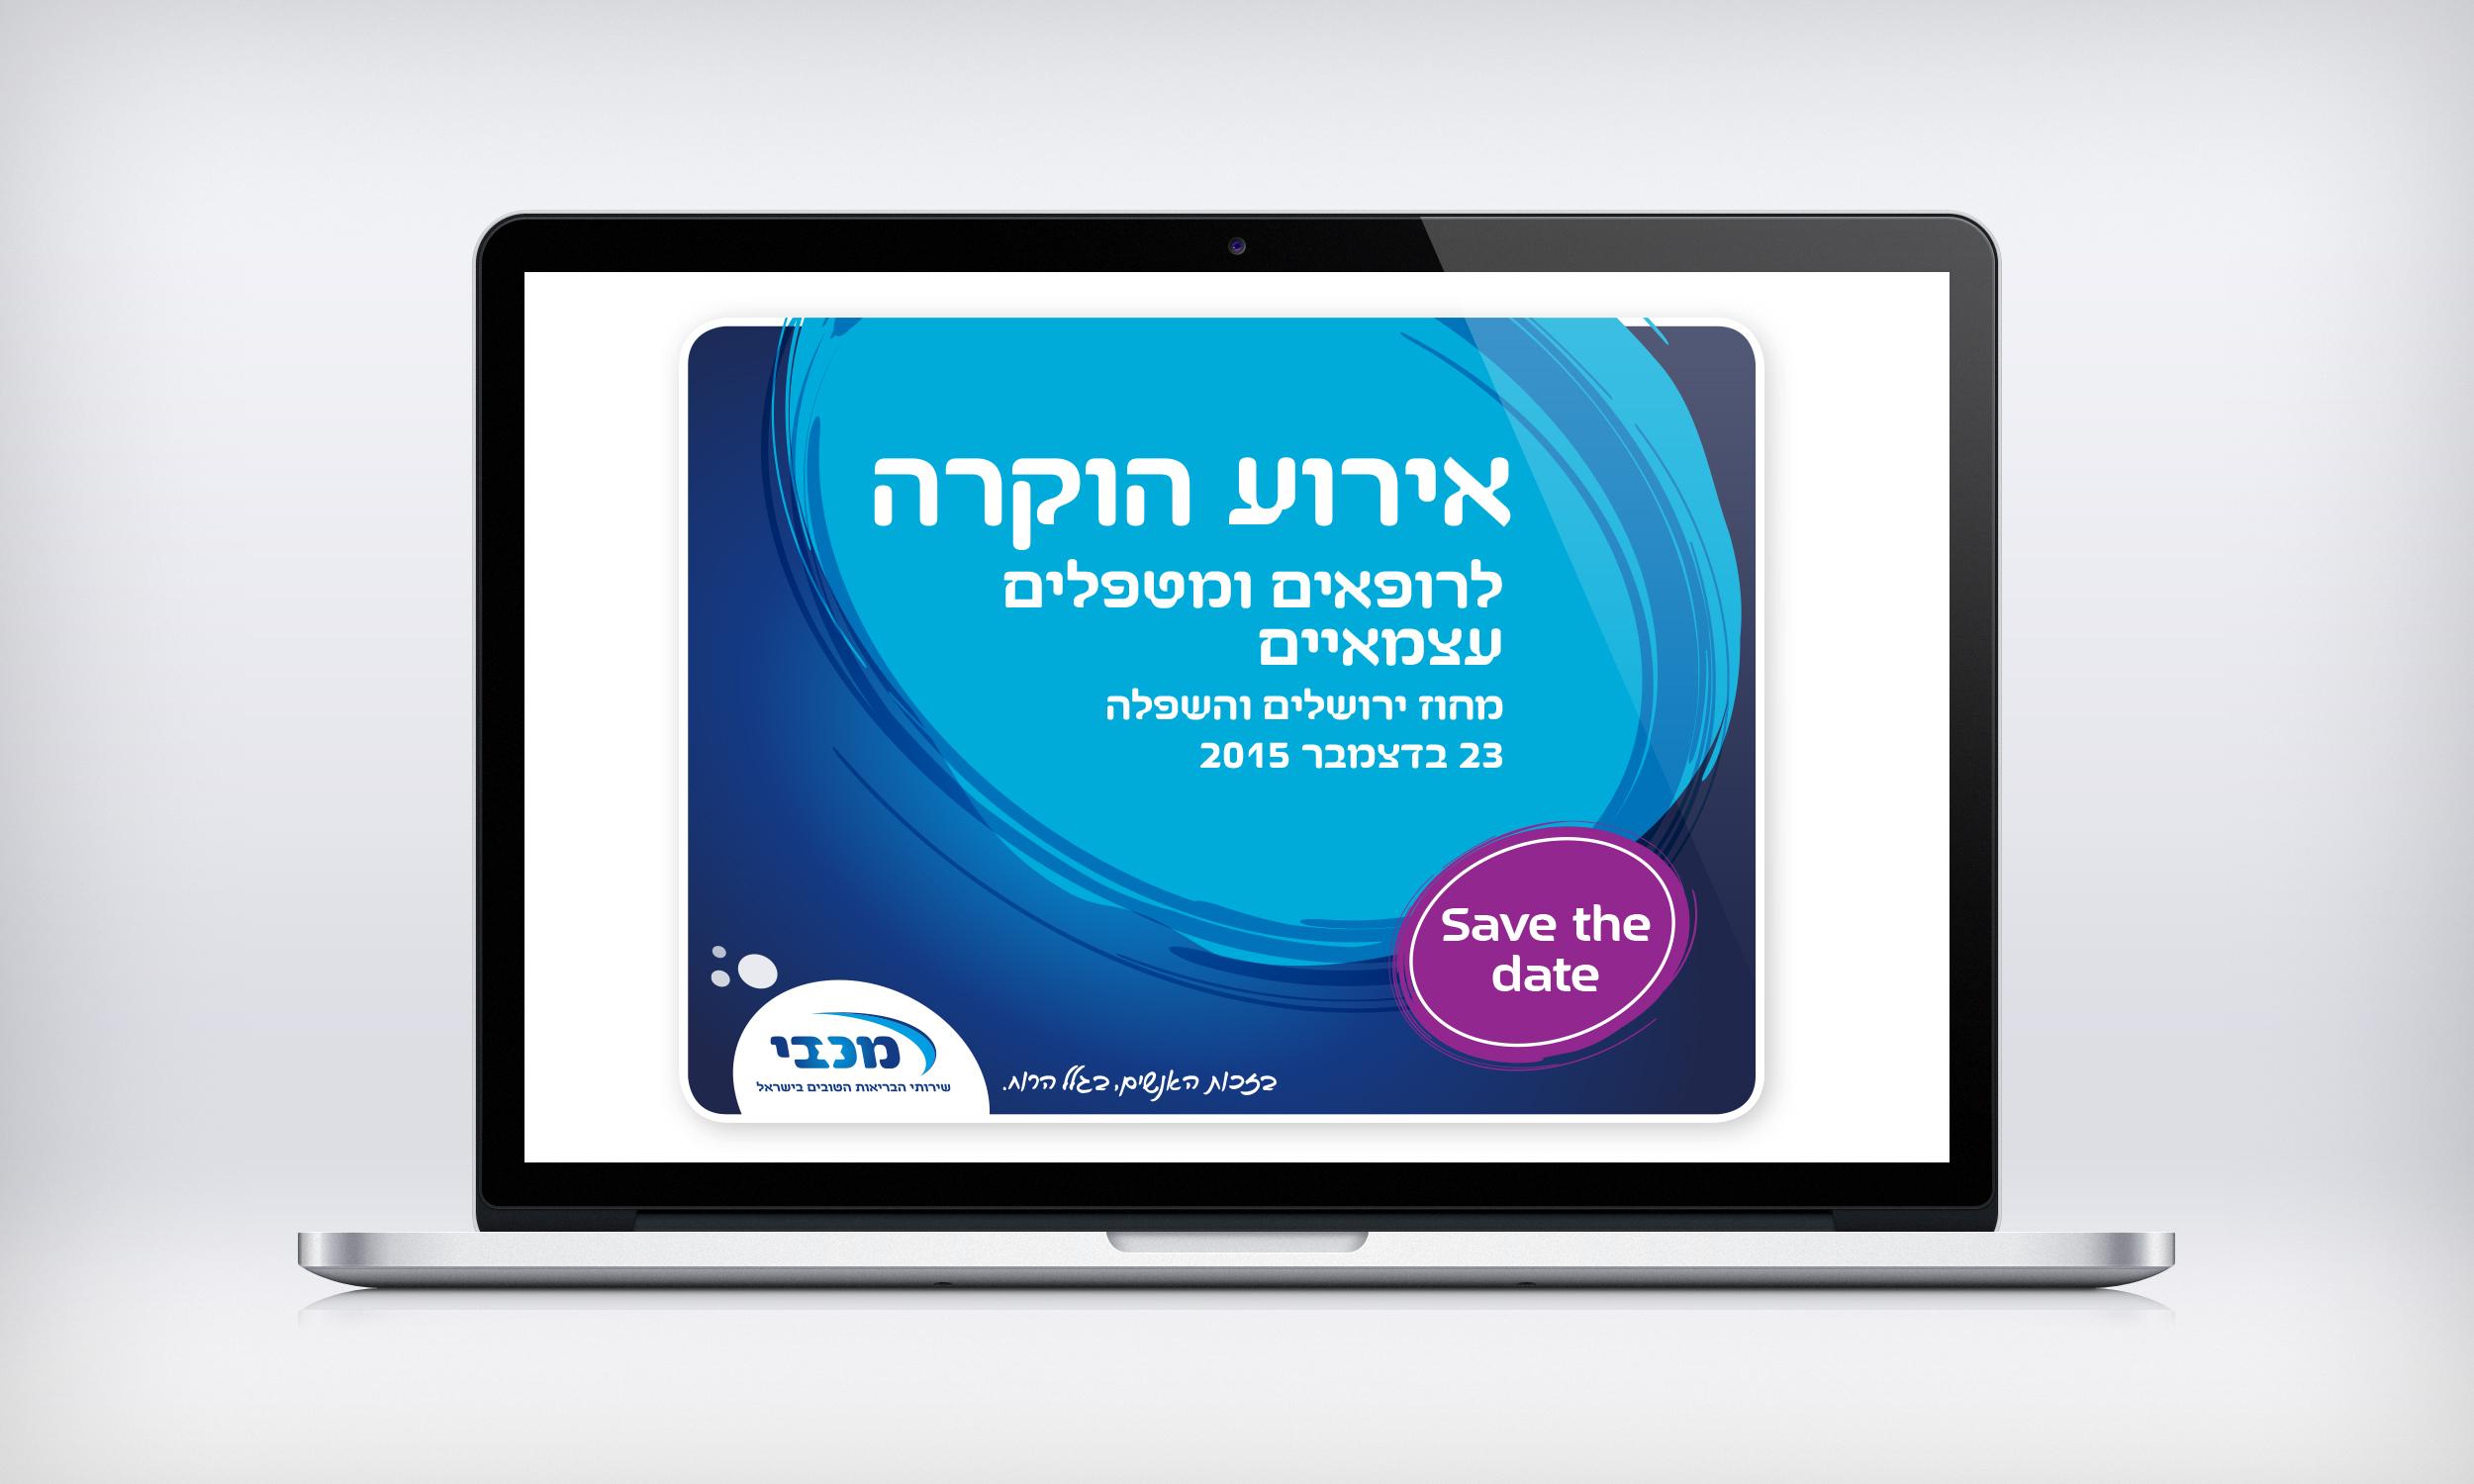 MaccabiMail2